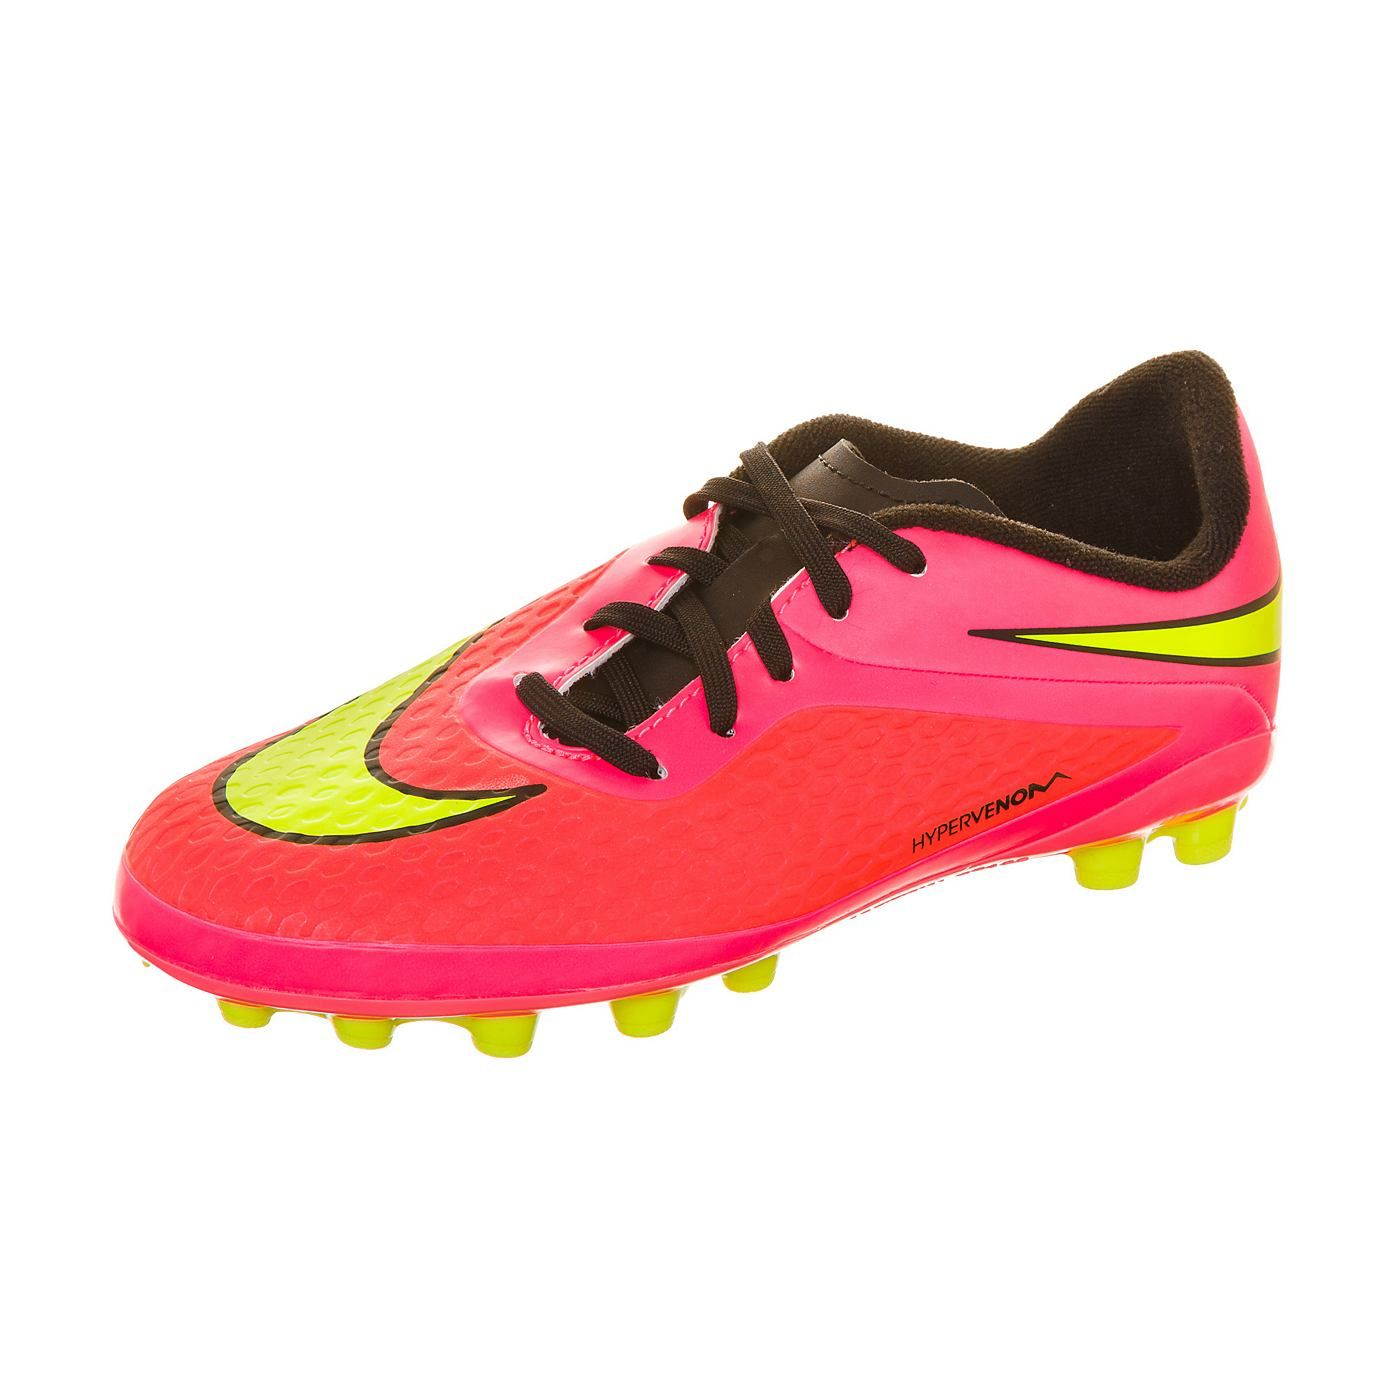 look for dirt cheap best service Nike Hypervenom Phelon II Indoor Fußballschuh Kinder | Max ...